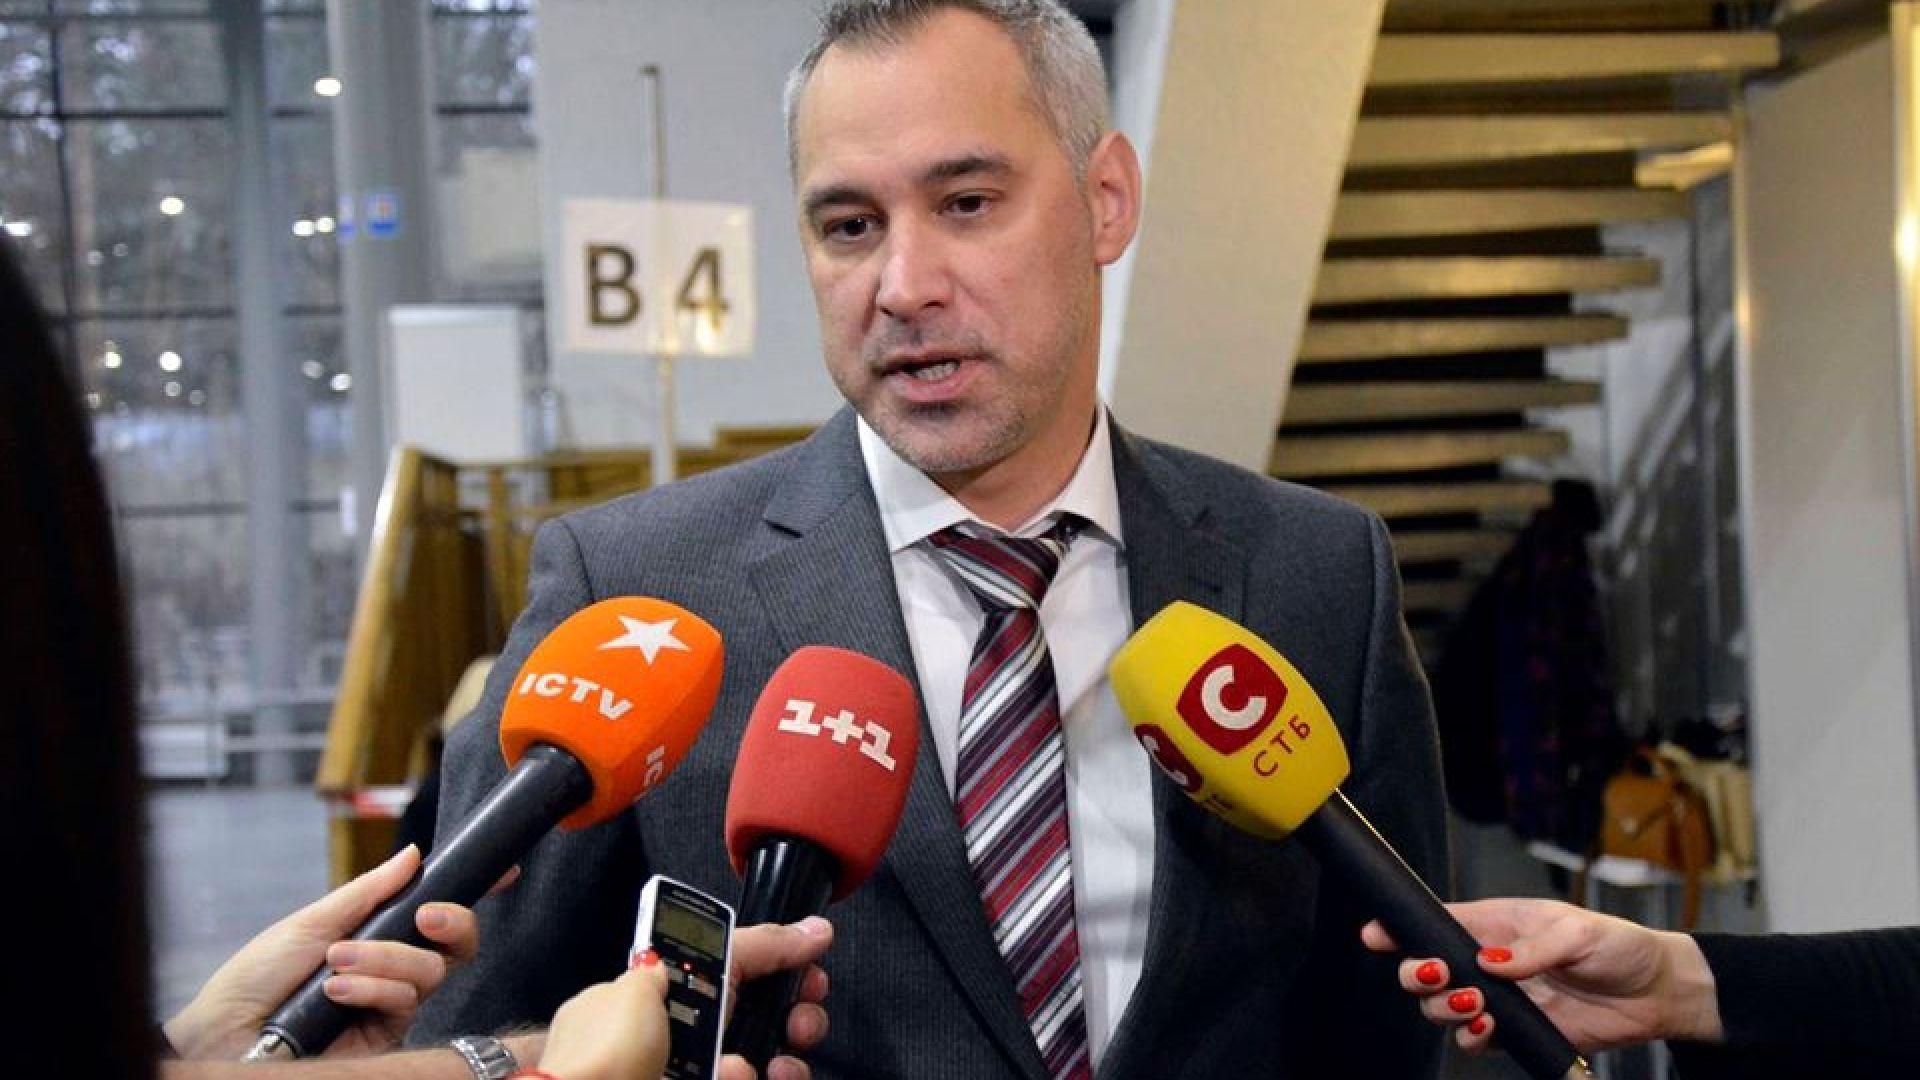 Украинските депутати гласуваха вот на недоверие на главния прокурор Руслан